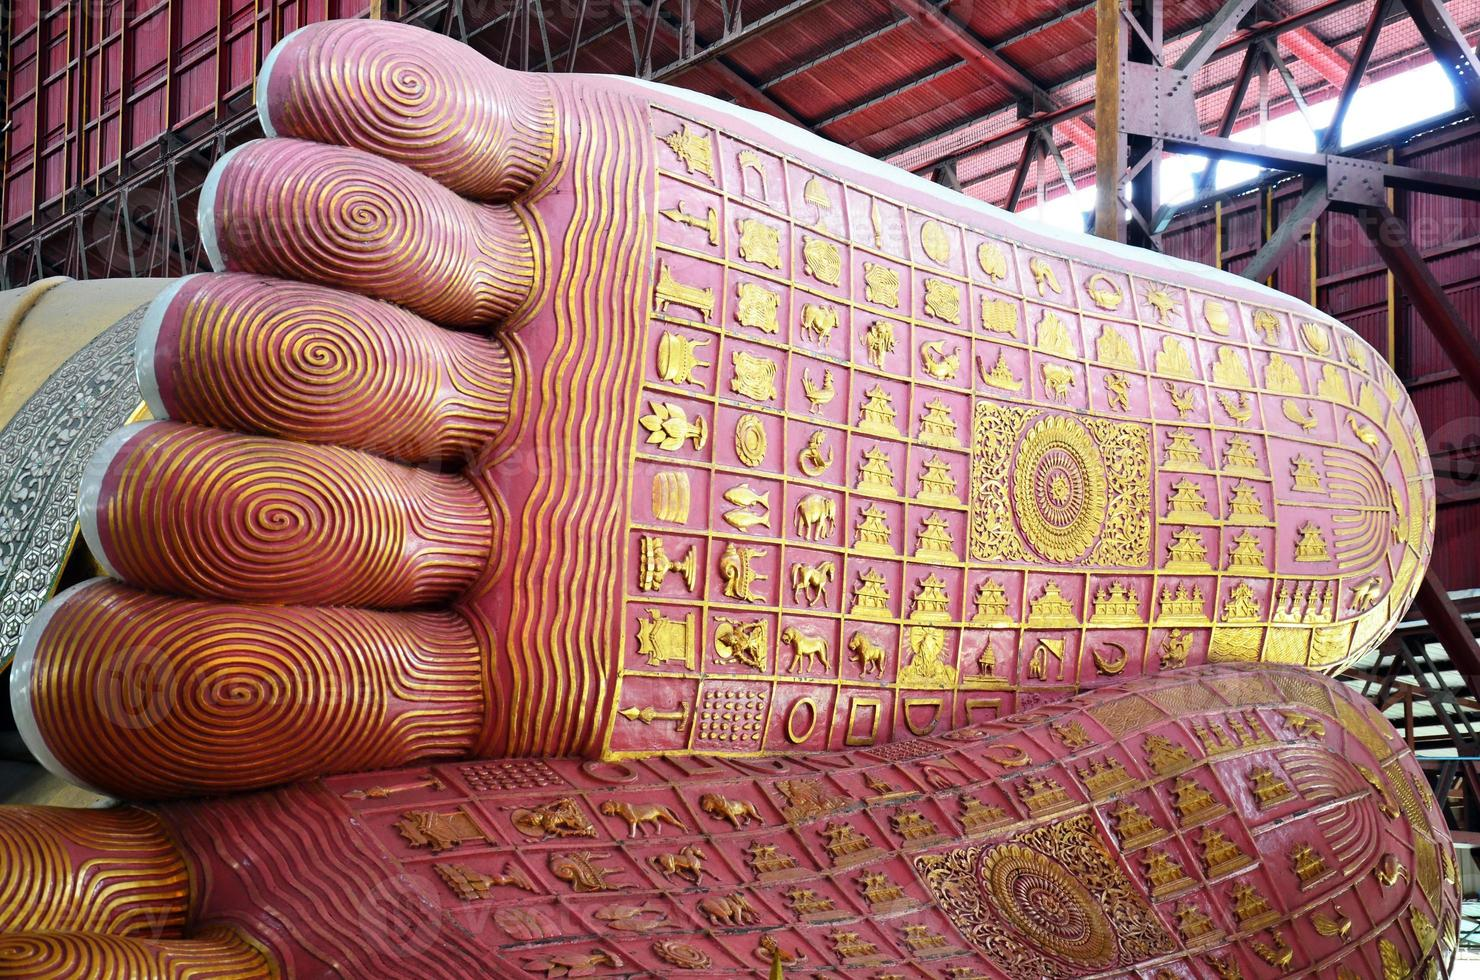 empreinte de chauk htat gyi image de Bouddha couché photo